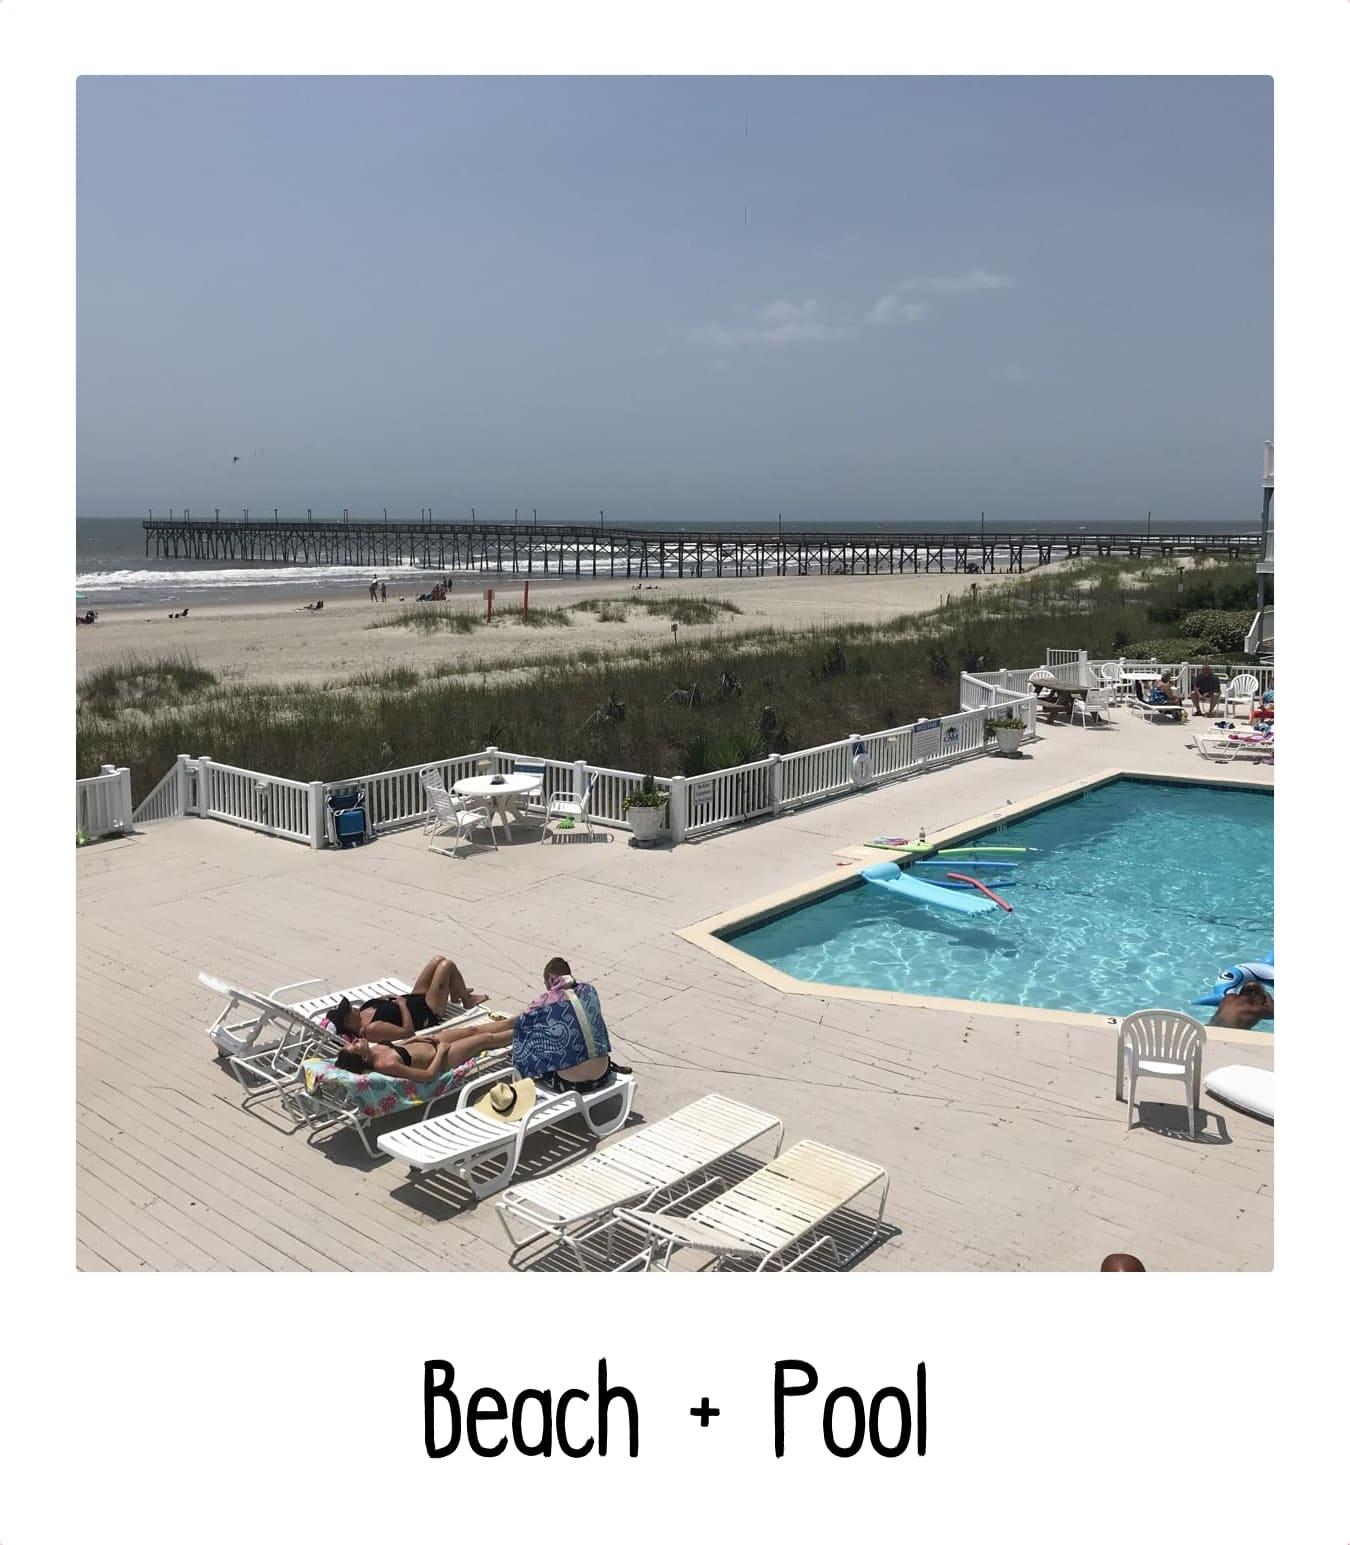 Ocean Isle Beach and Pool